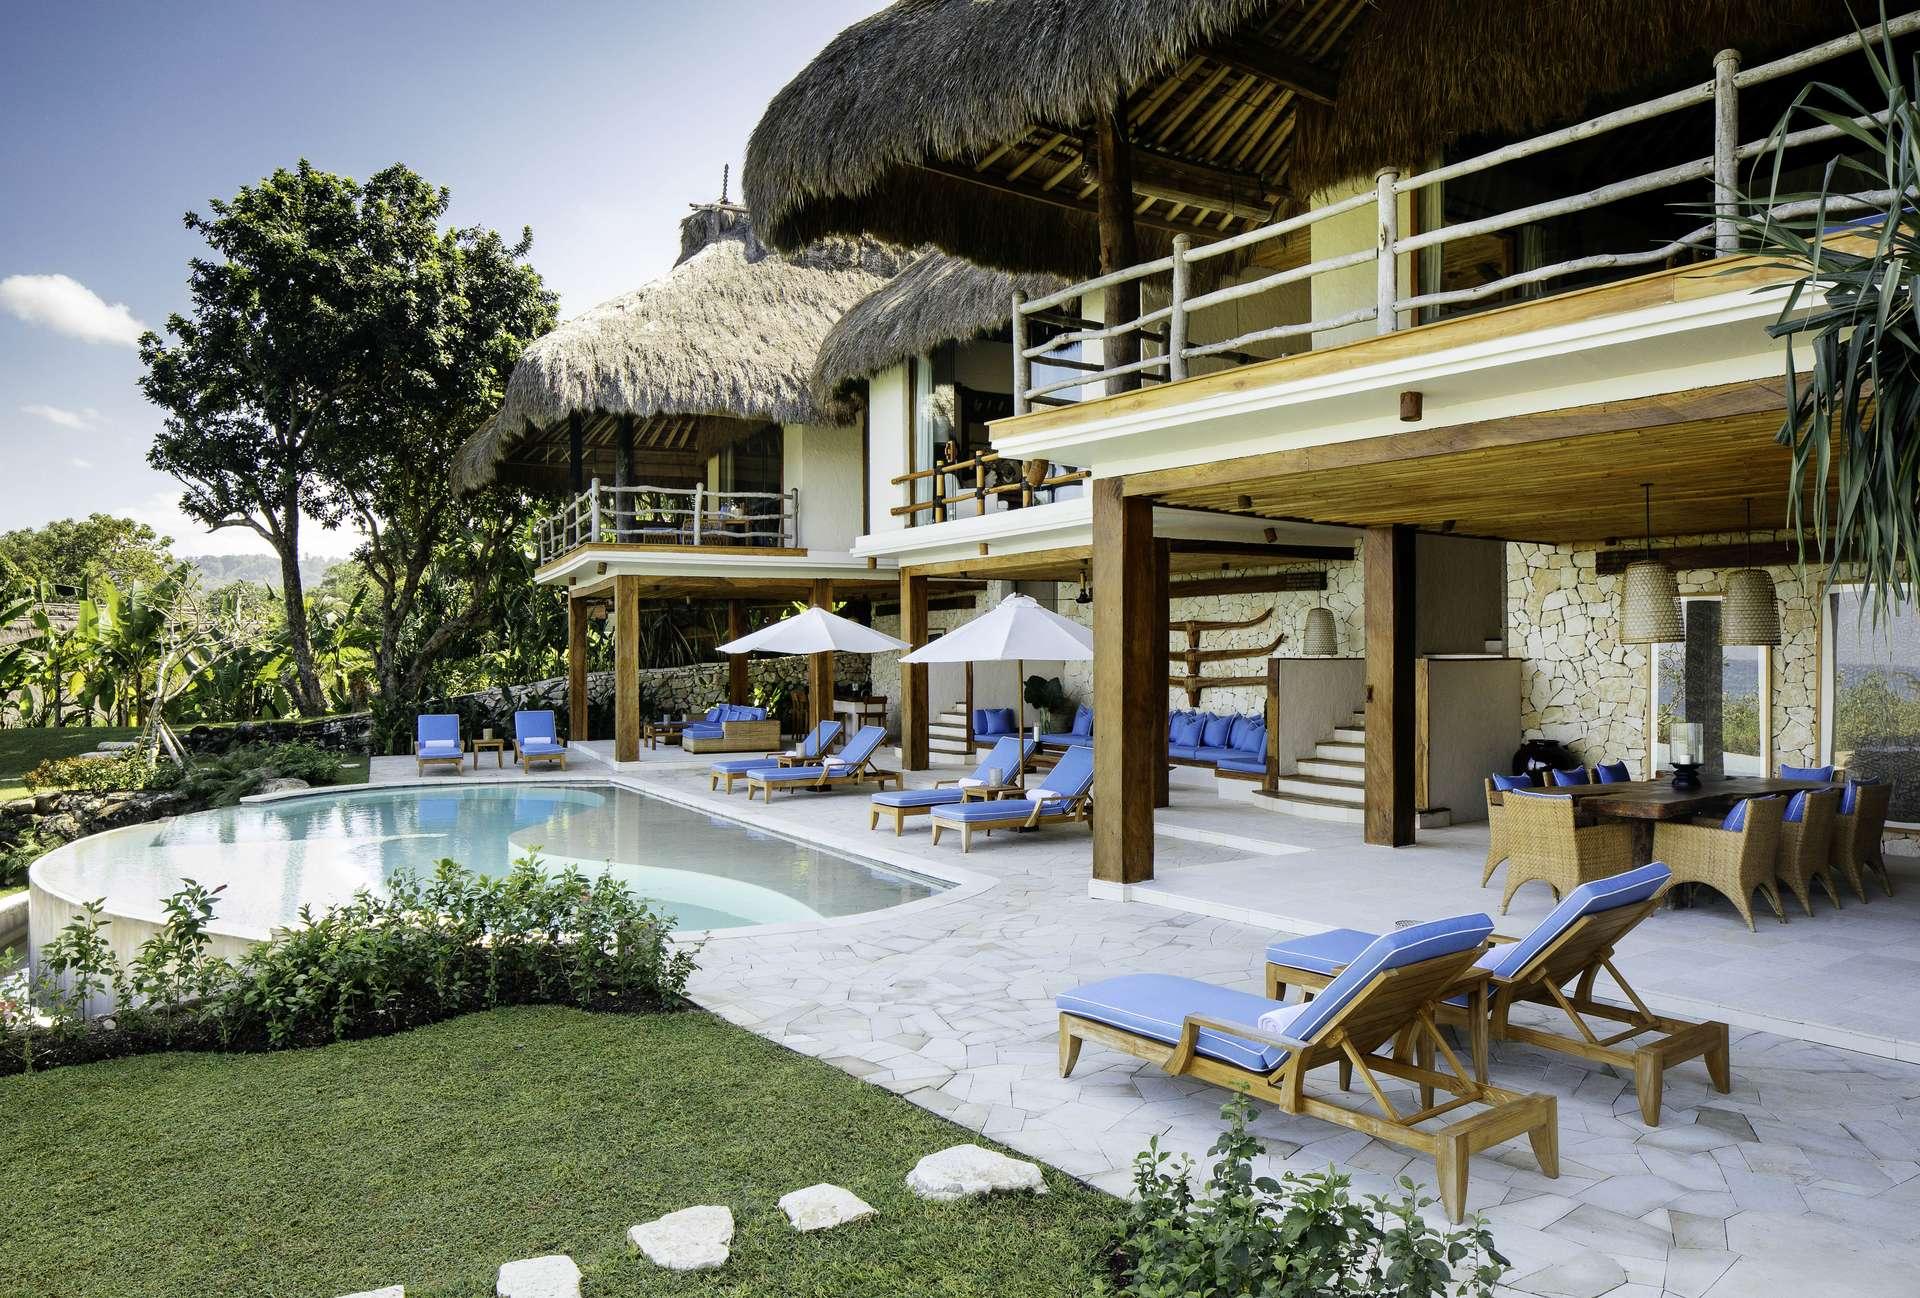 Luxury villa rentals asia - Indonesia - Sumba - Nihi sumba - 2 BDM Lantoro Villa - Image 1/12